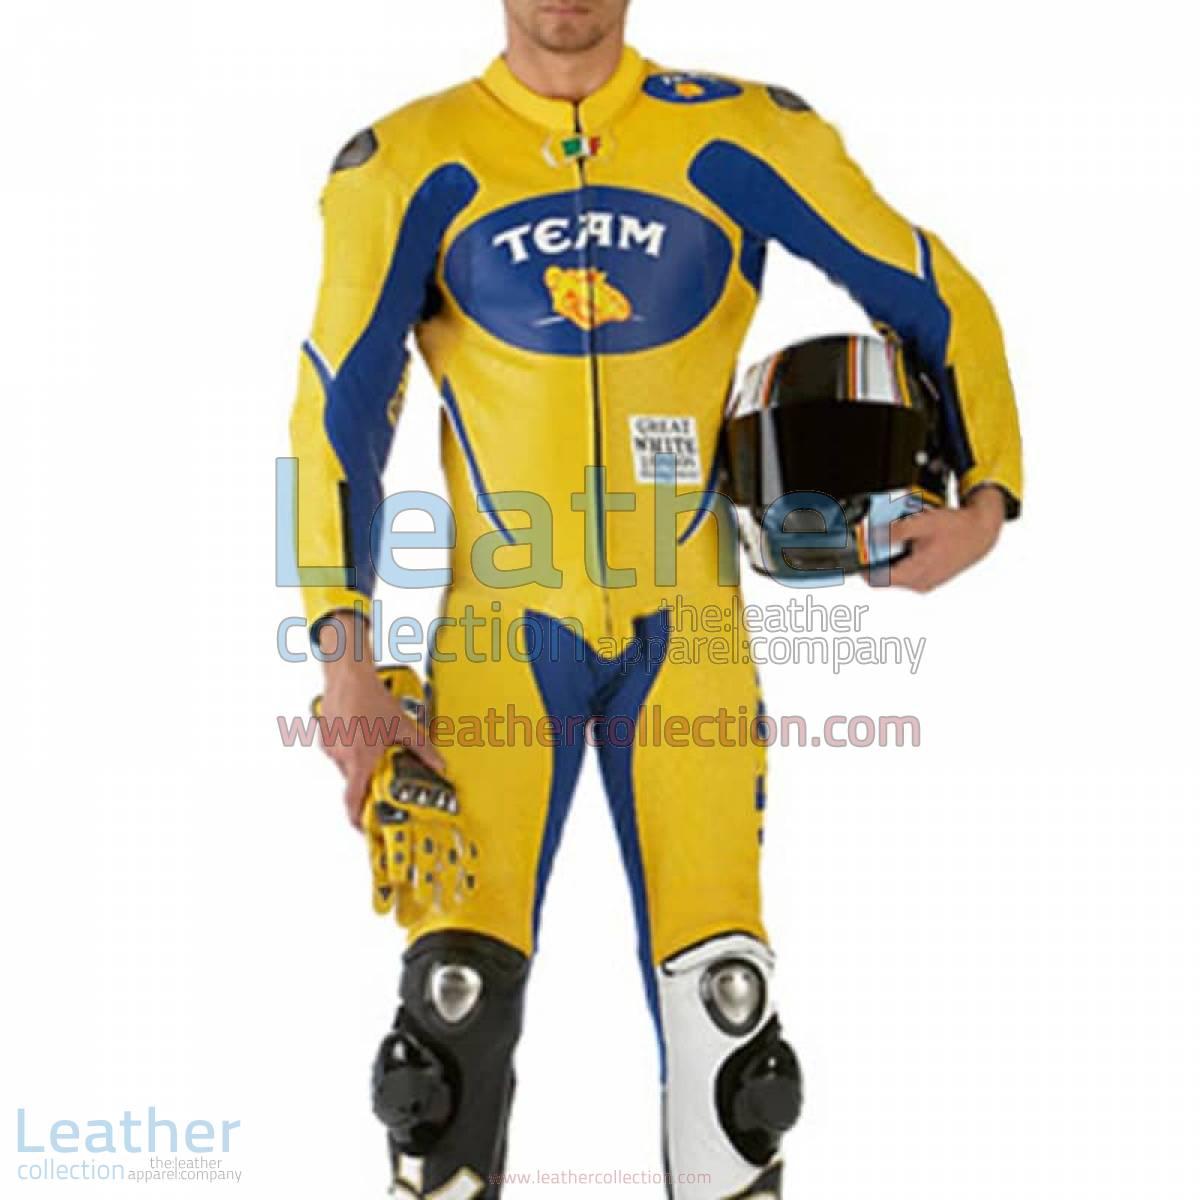 VR46 Team Motorcycle Racing Leather Suit | motorcycle racing suit